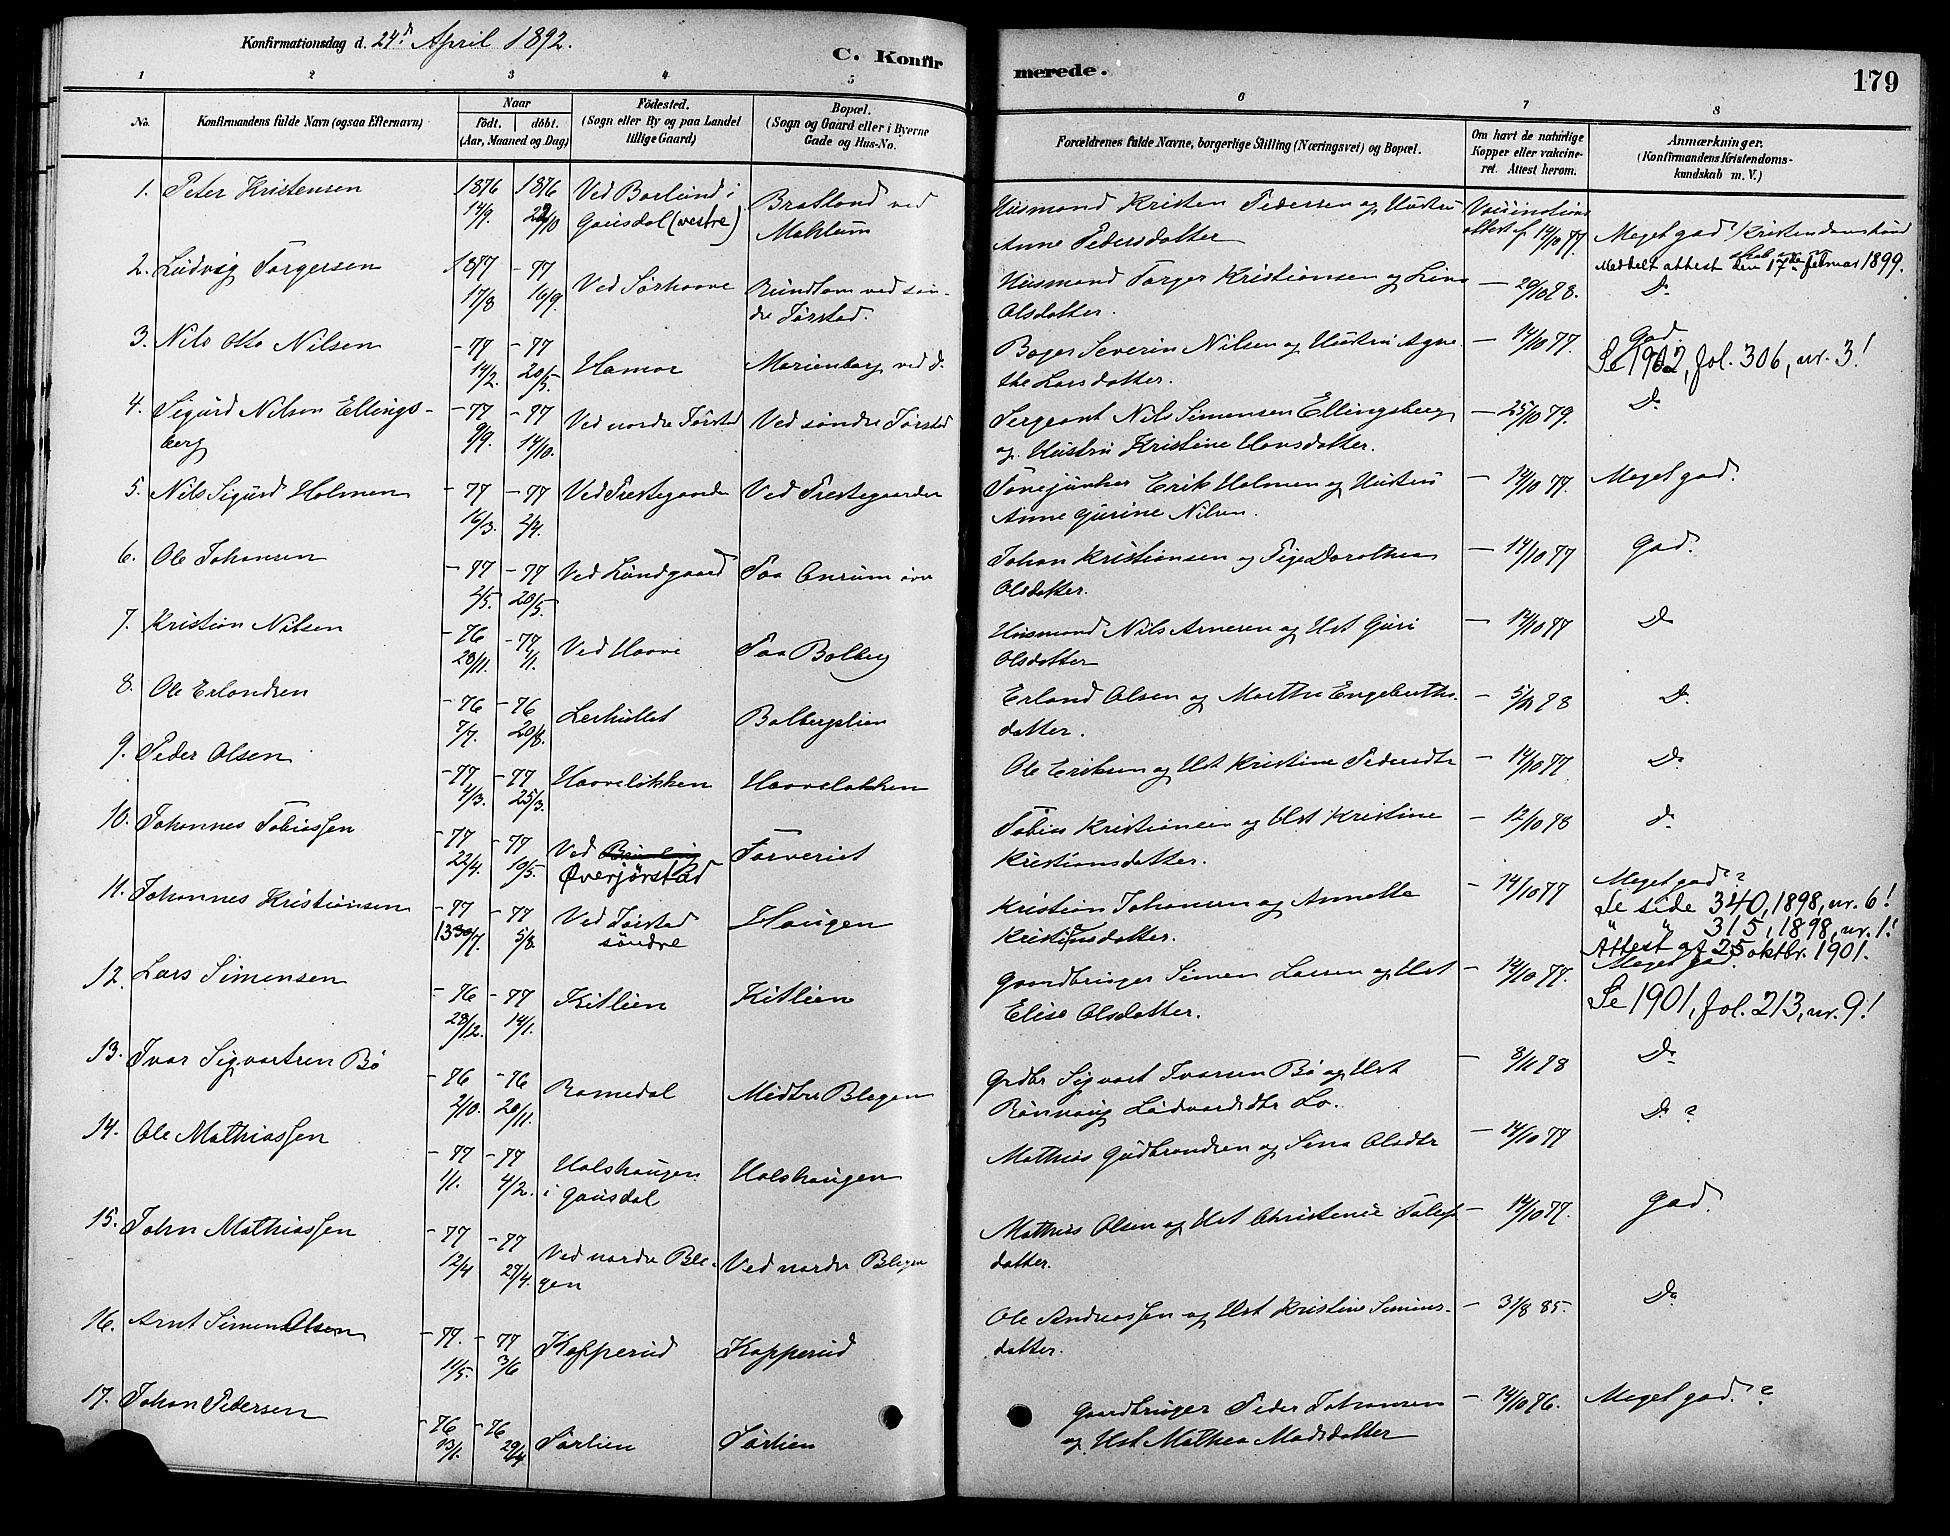 SAH, Fåberg prestekontor, Ministerialbok nr. 8, 1879-1898, s. 179